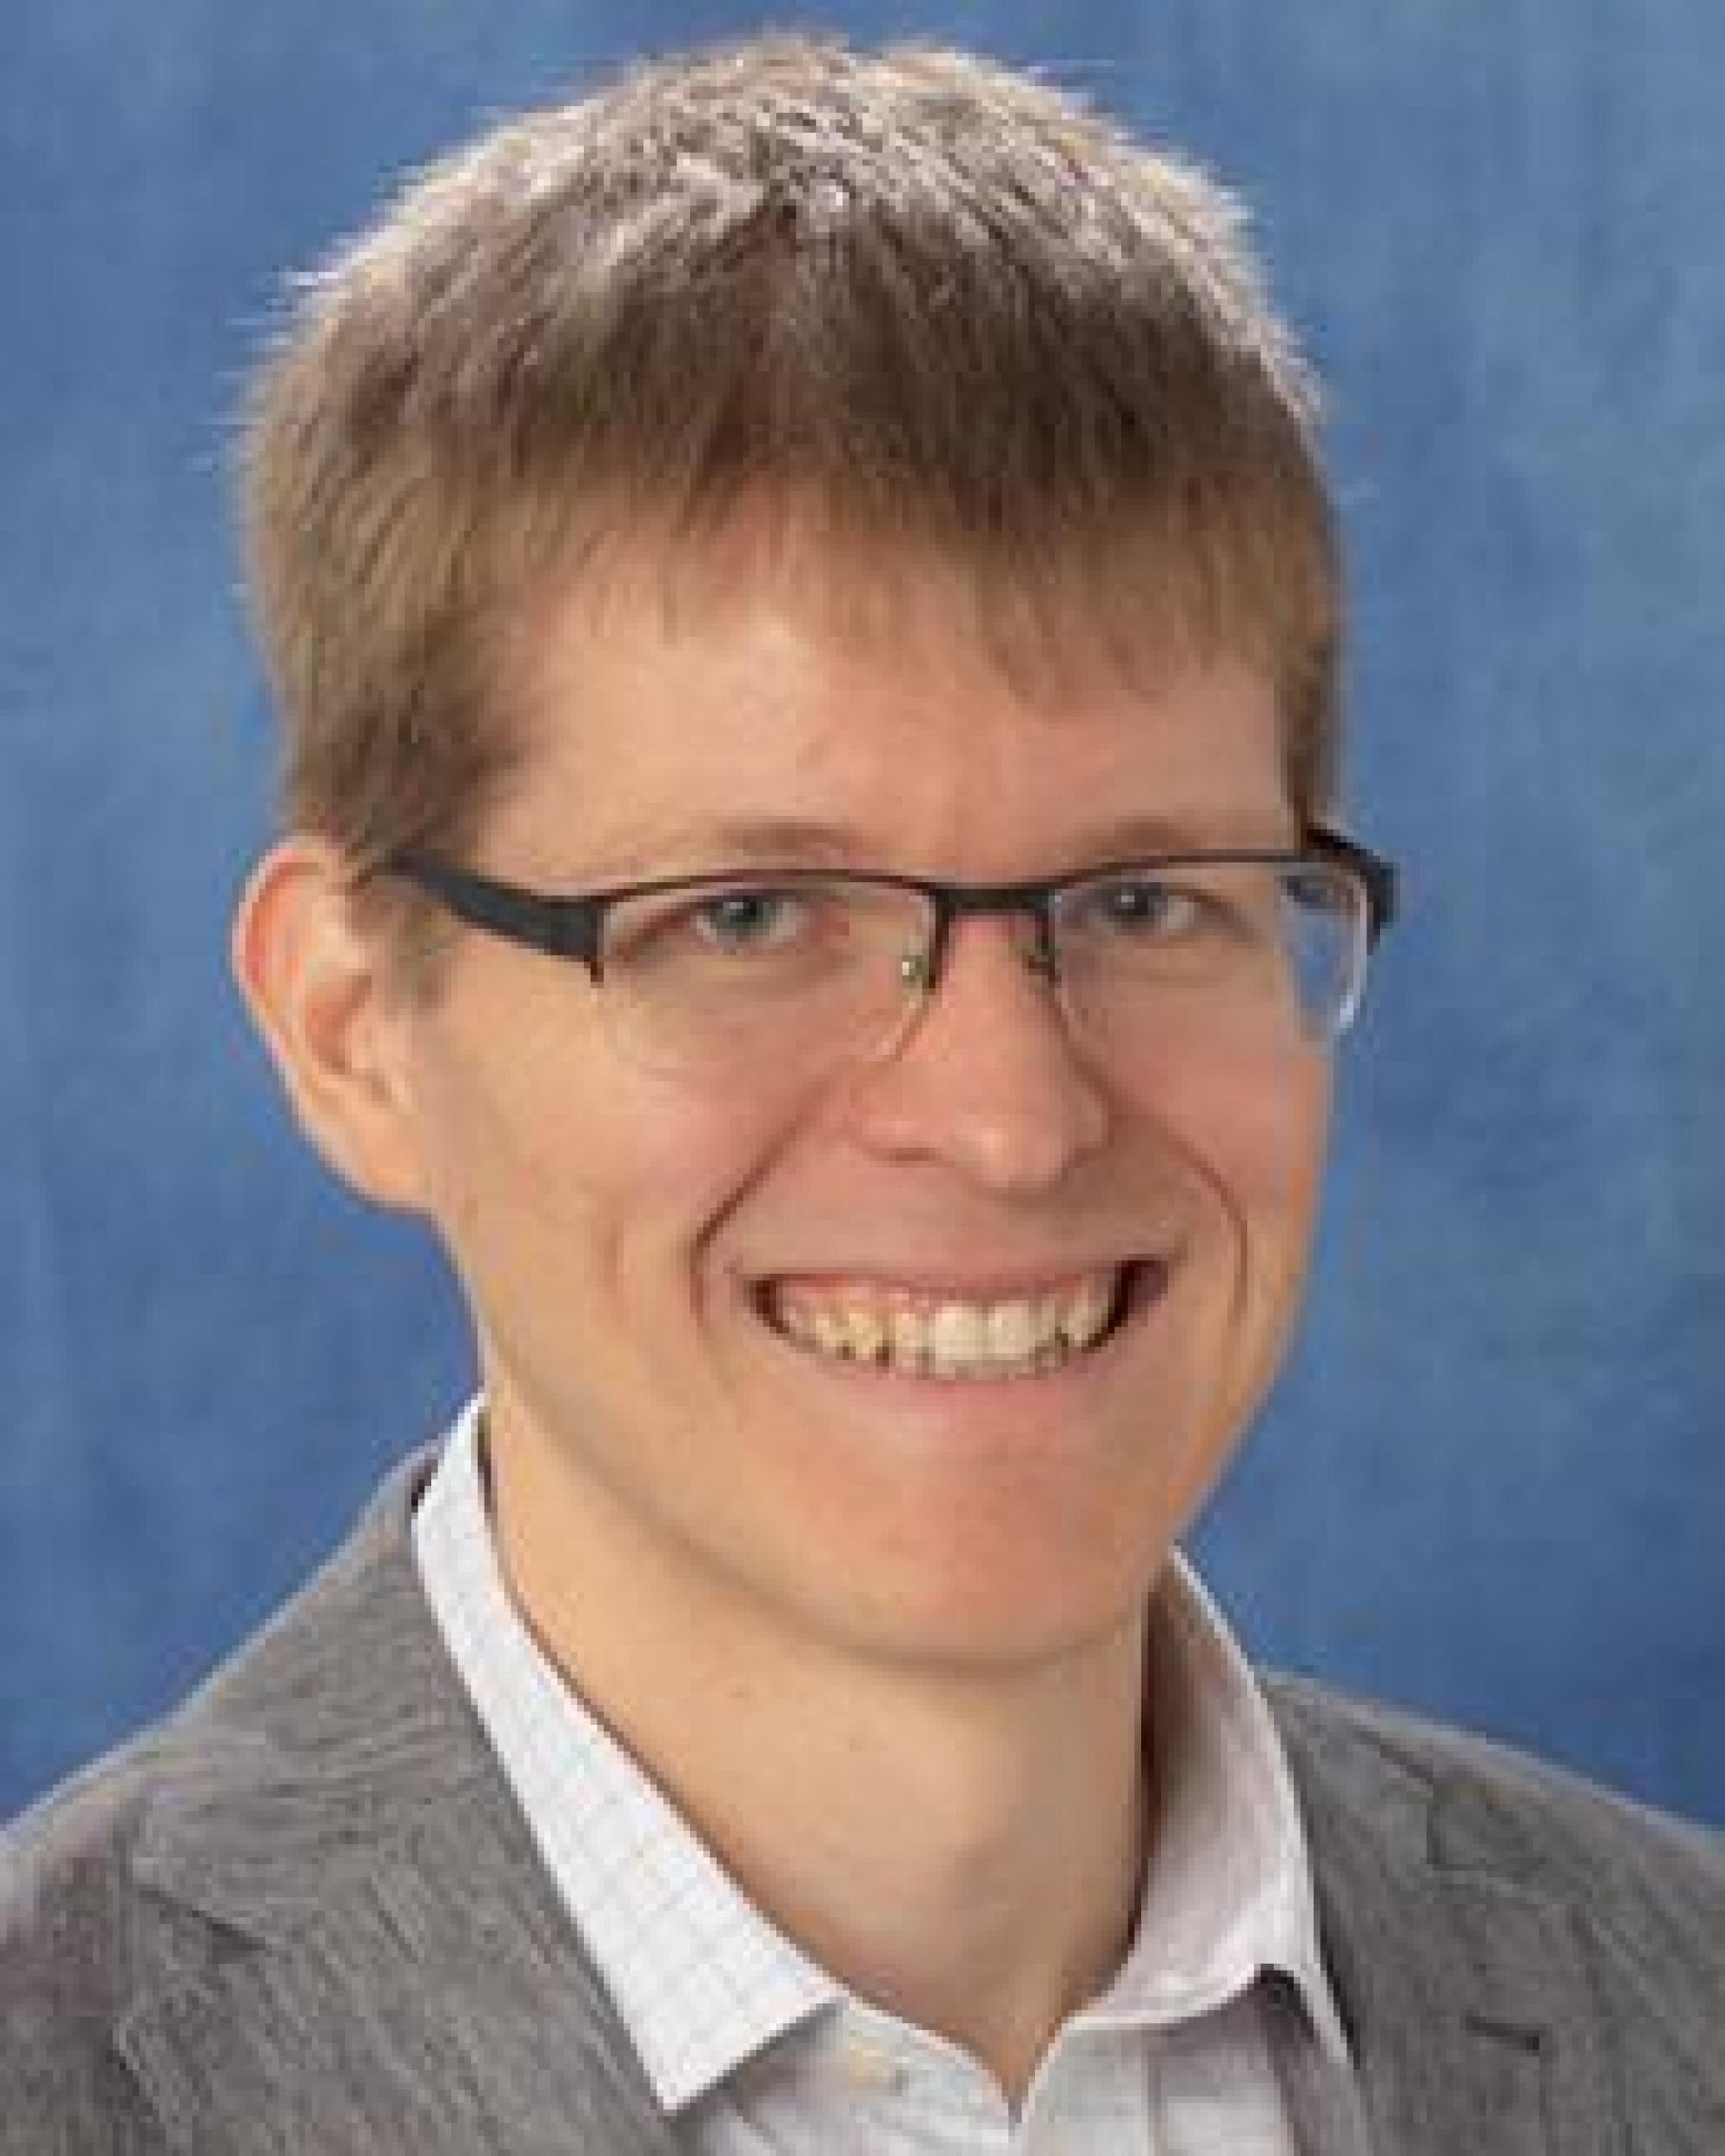 Kristopher Klein